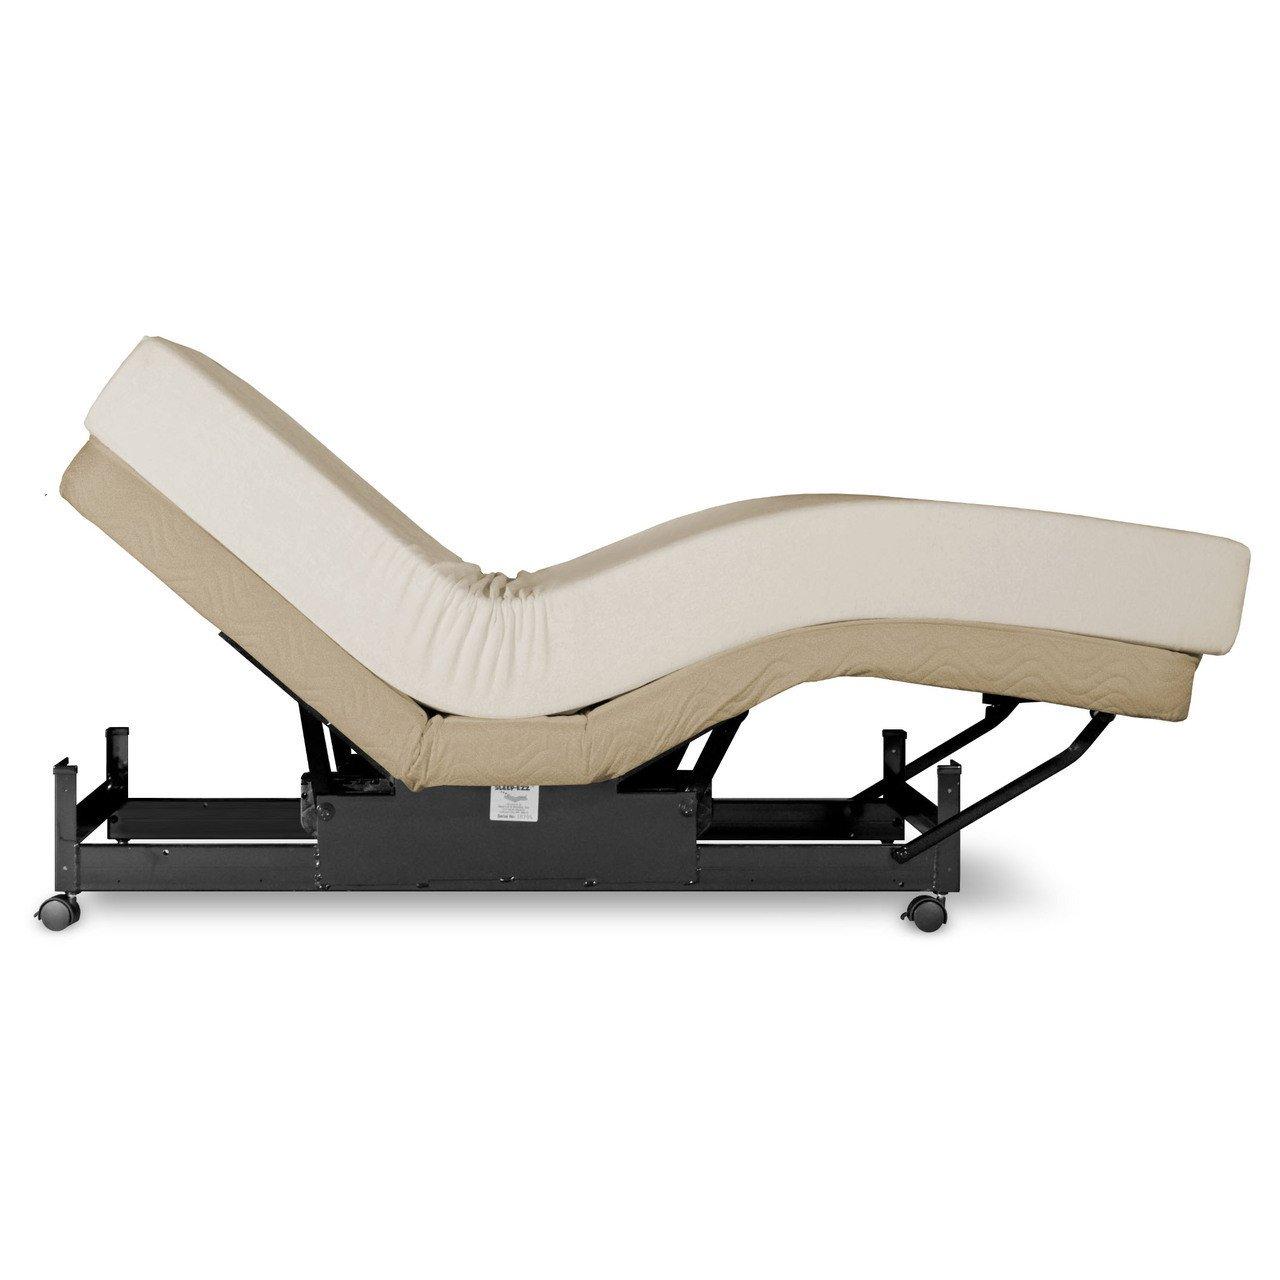 Sleep-Ezz Standard Queen XL Adjustable Bed (Wired)